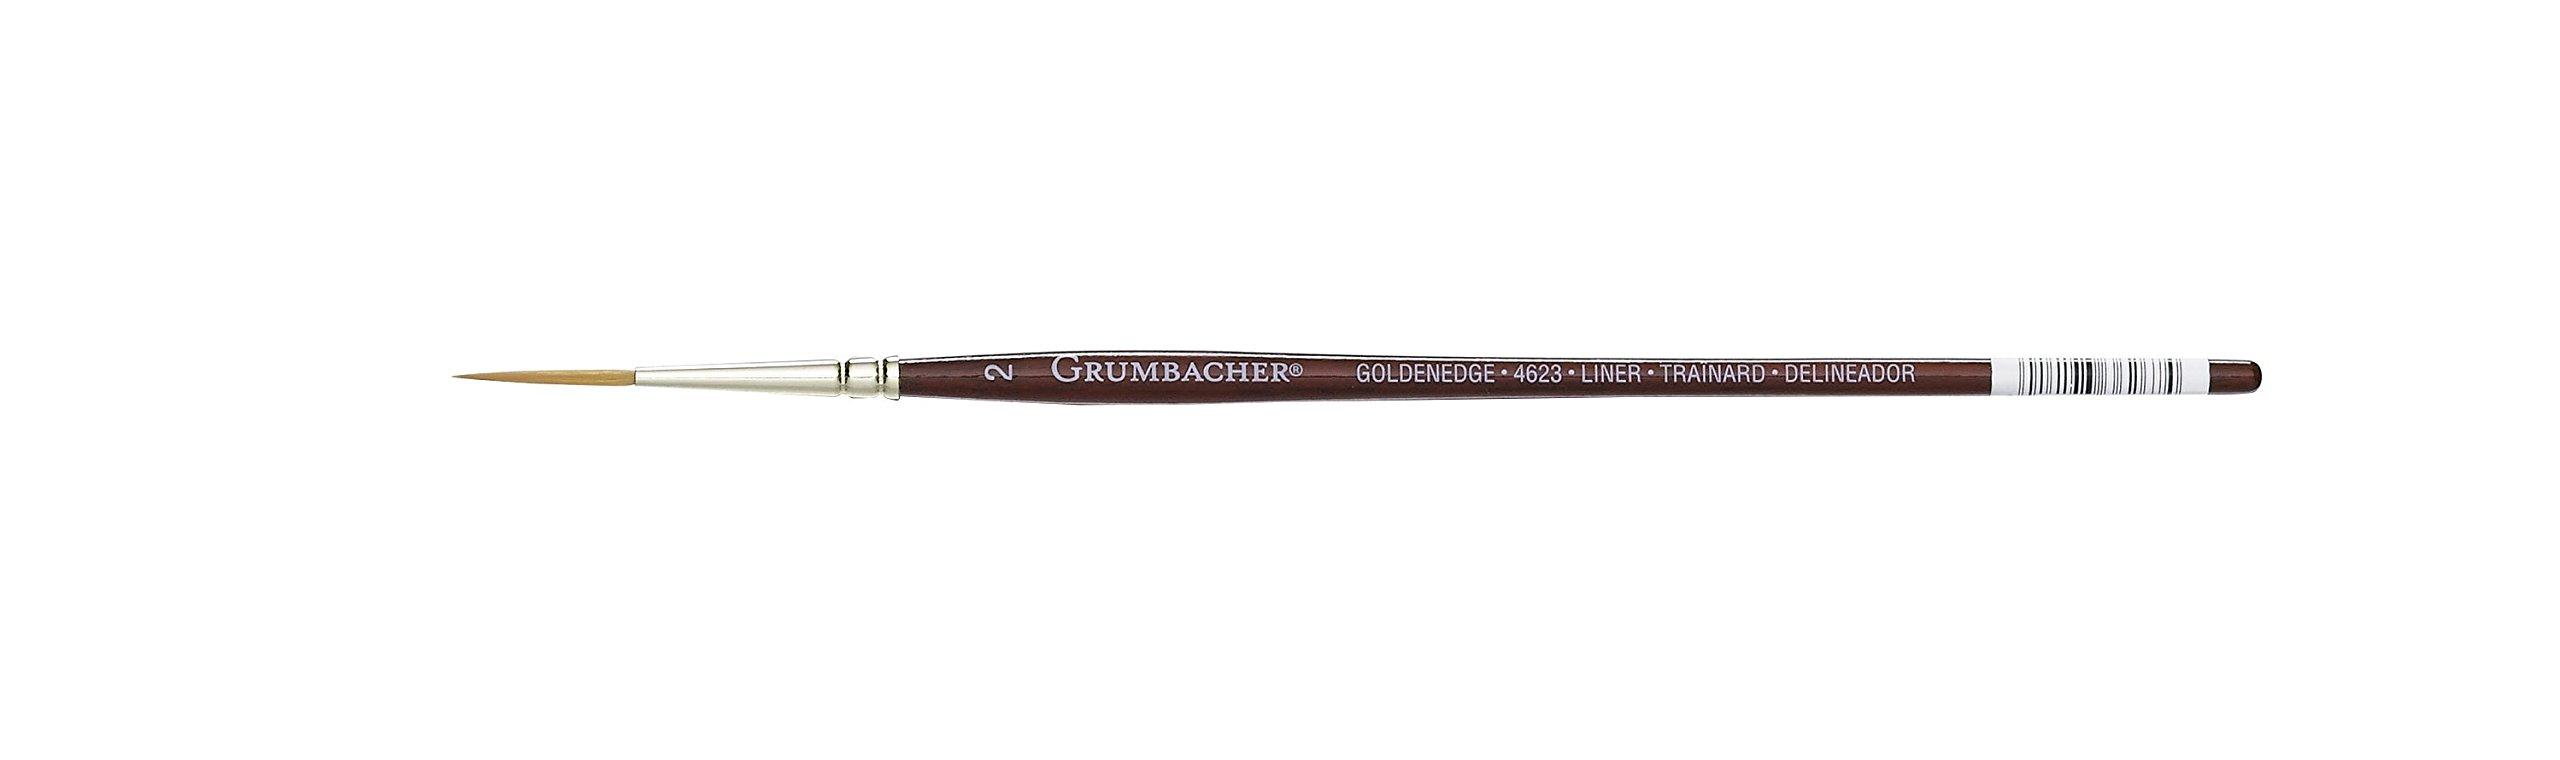 Grumbacher Goldenedge Golden Toray Liner Watercolor Brush, Synthetic Bristles, Size 2 (4623.2)